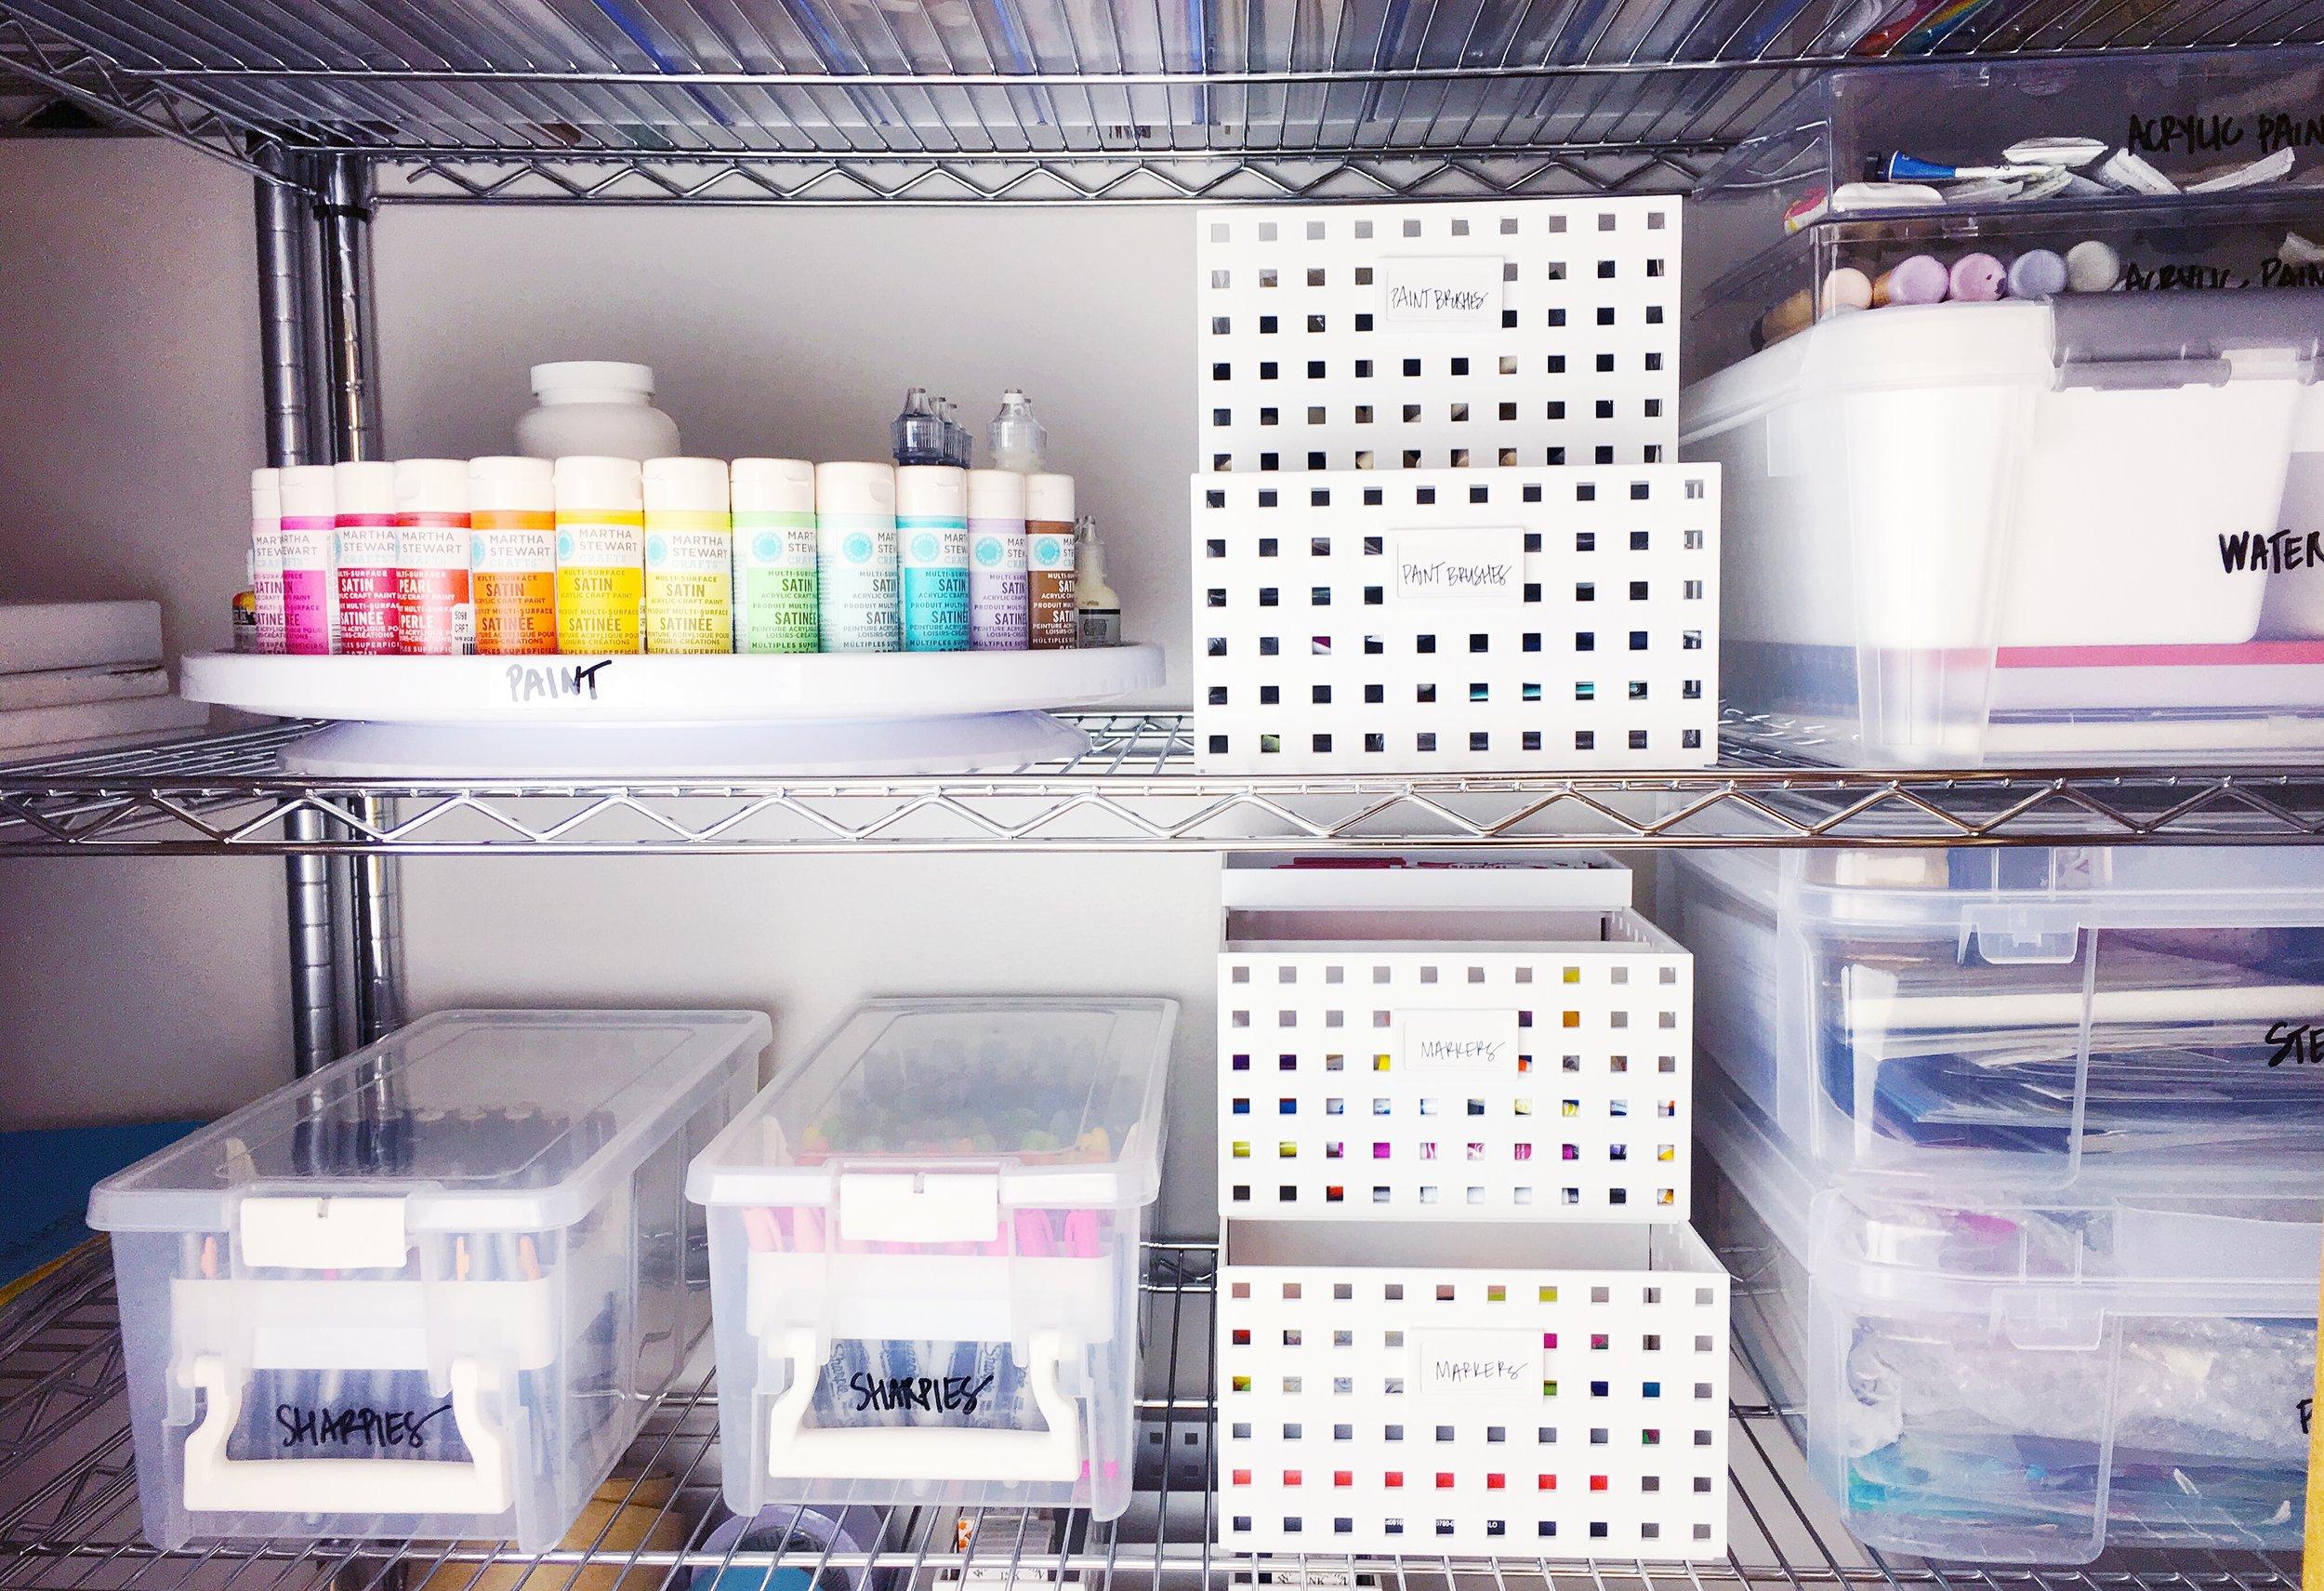 sharpie and paint organization